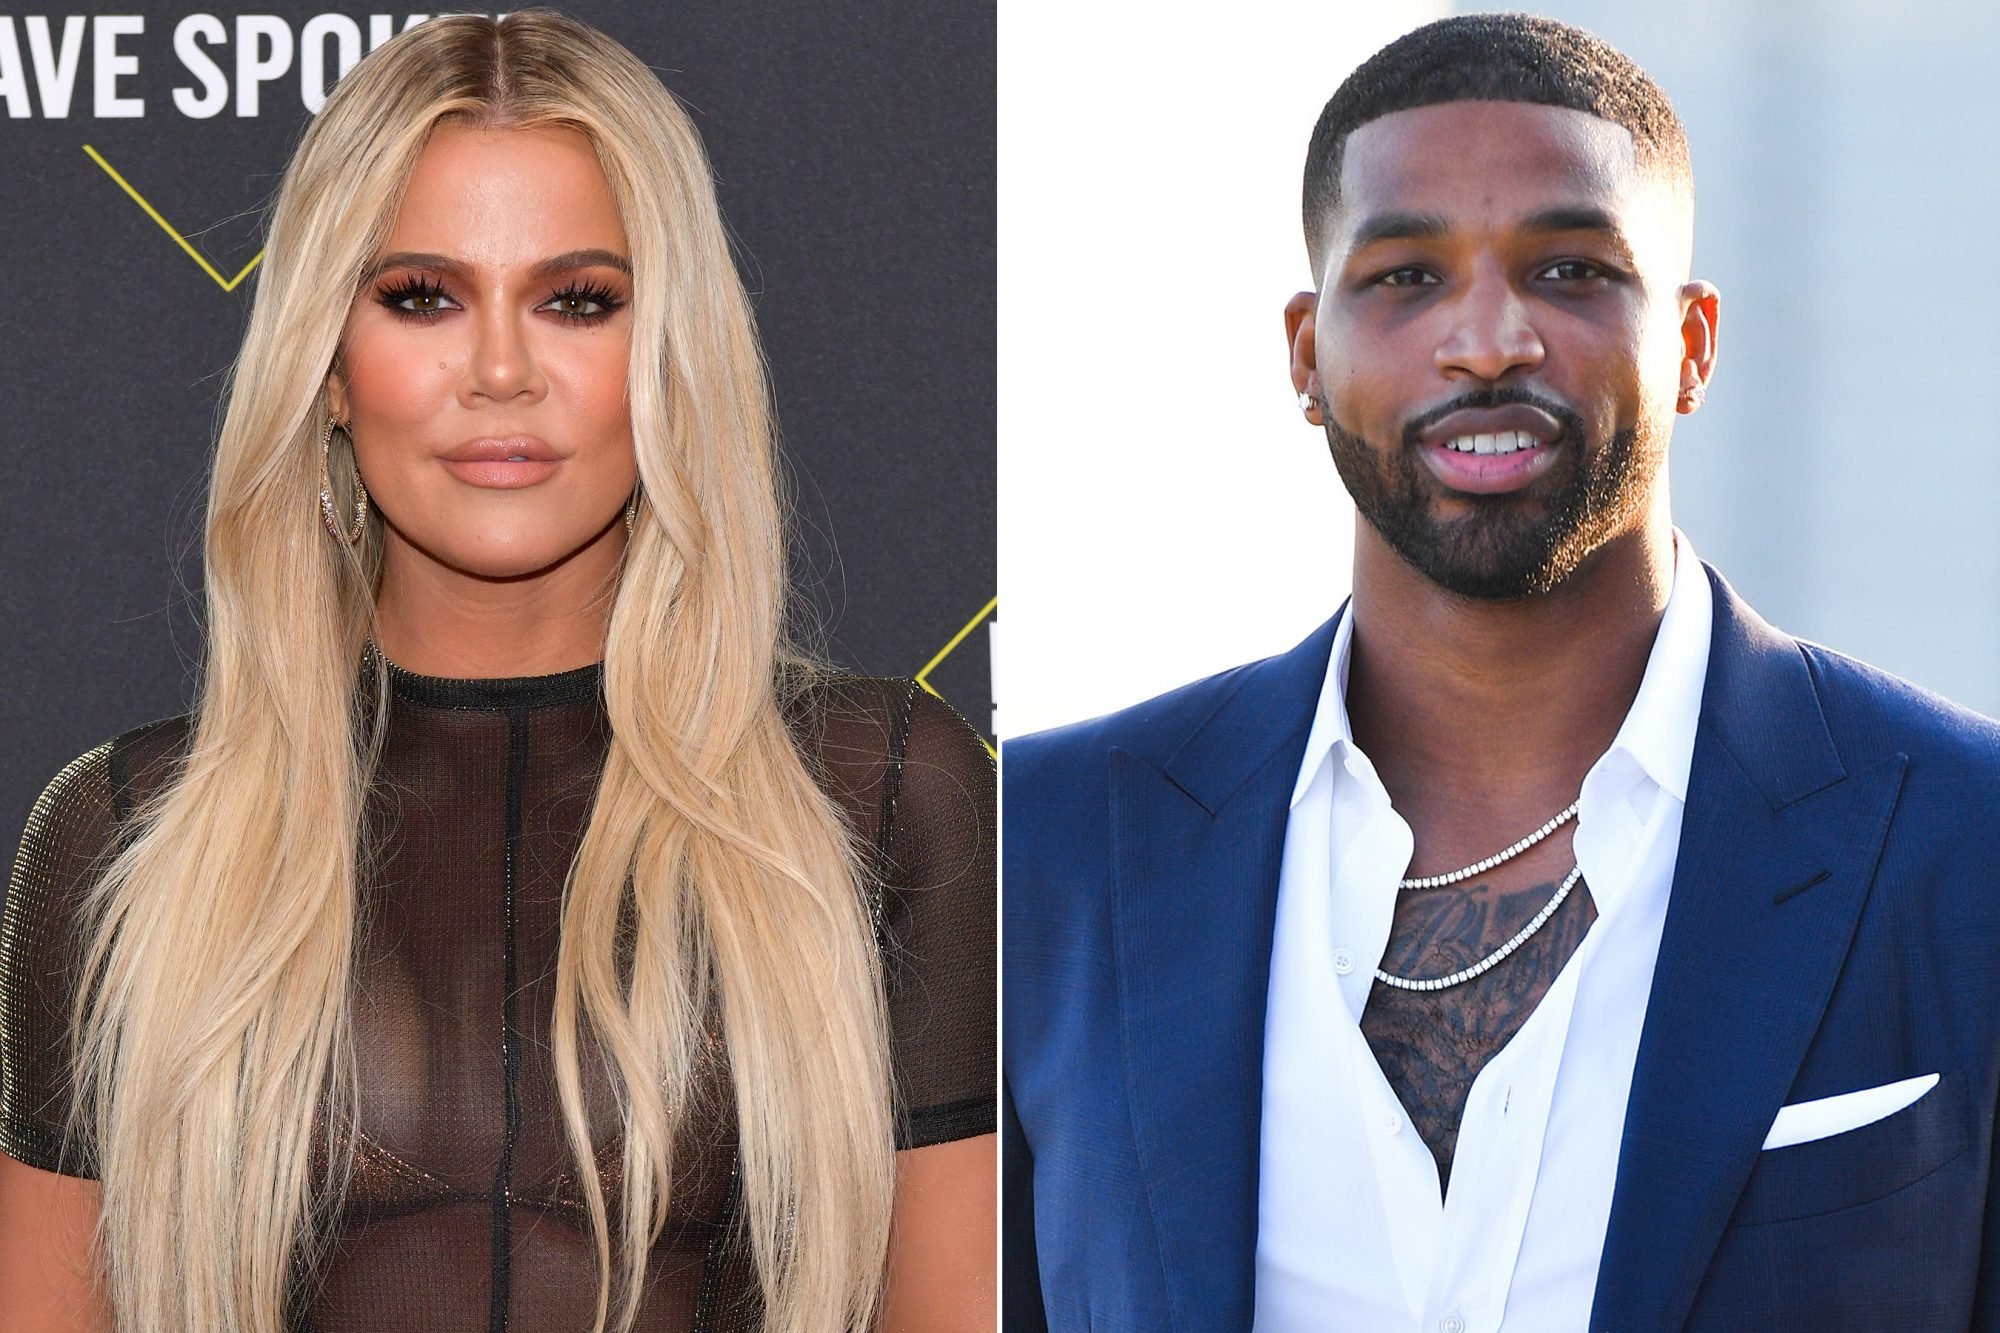 Khloe Kardashian, Tristan Thompson reportedly reconcile after break-up